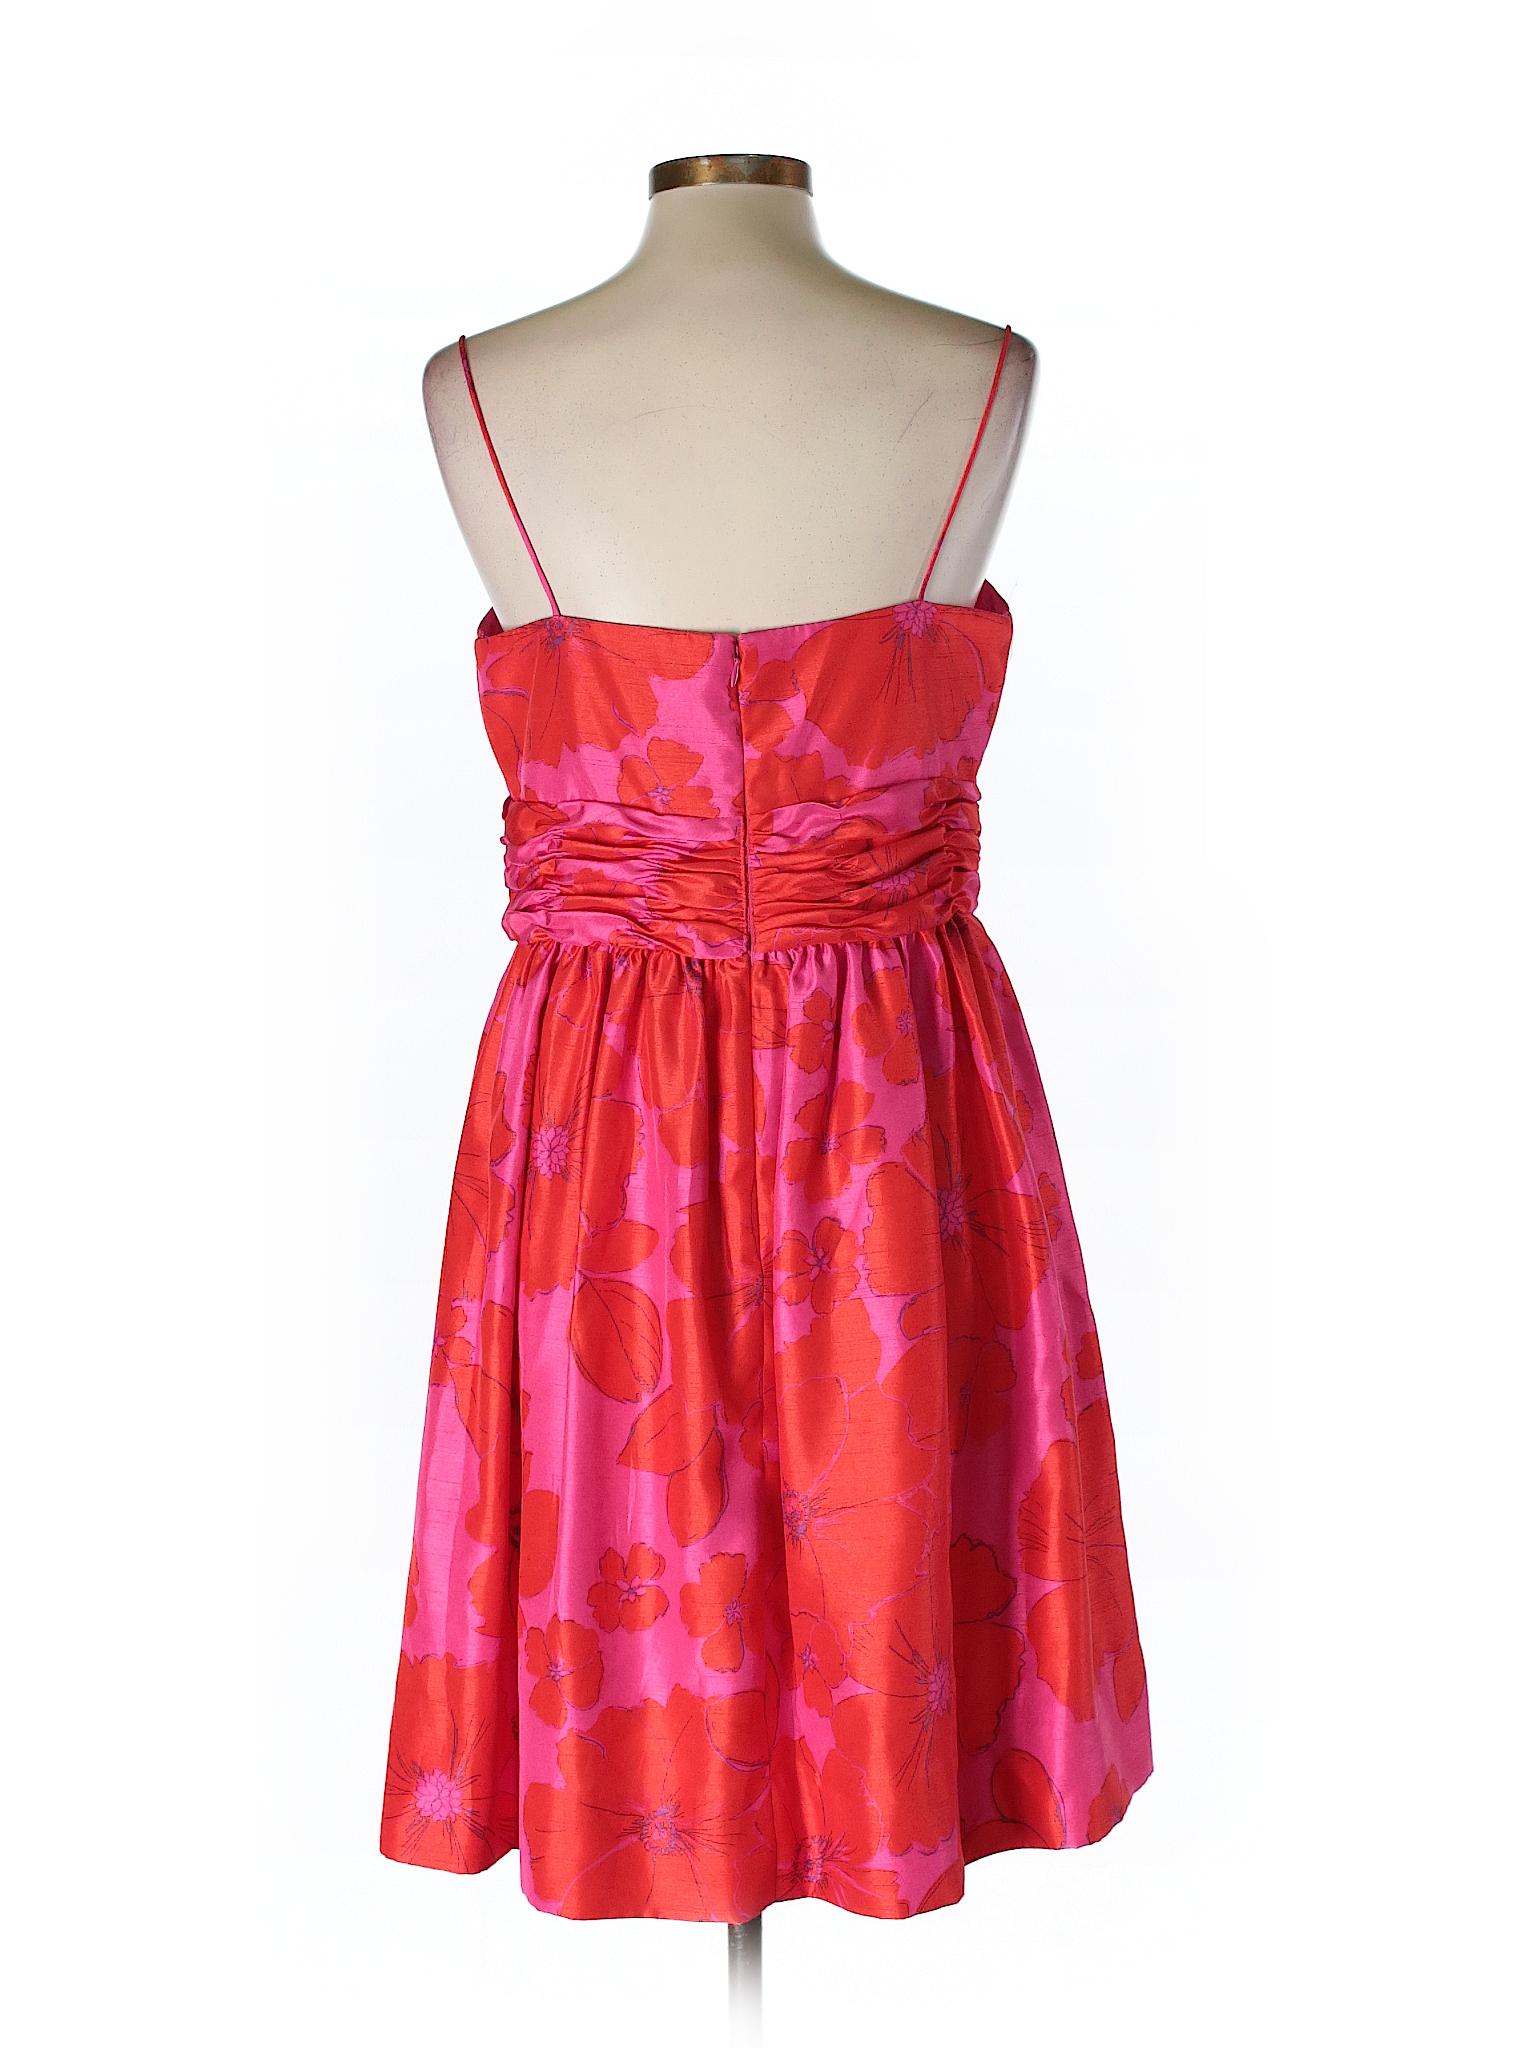 Casual Dress Selling Casual Eliza Dress Eliza J Selling J wSqPq7xf